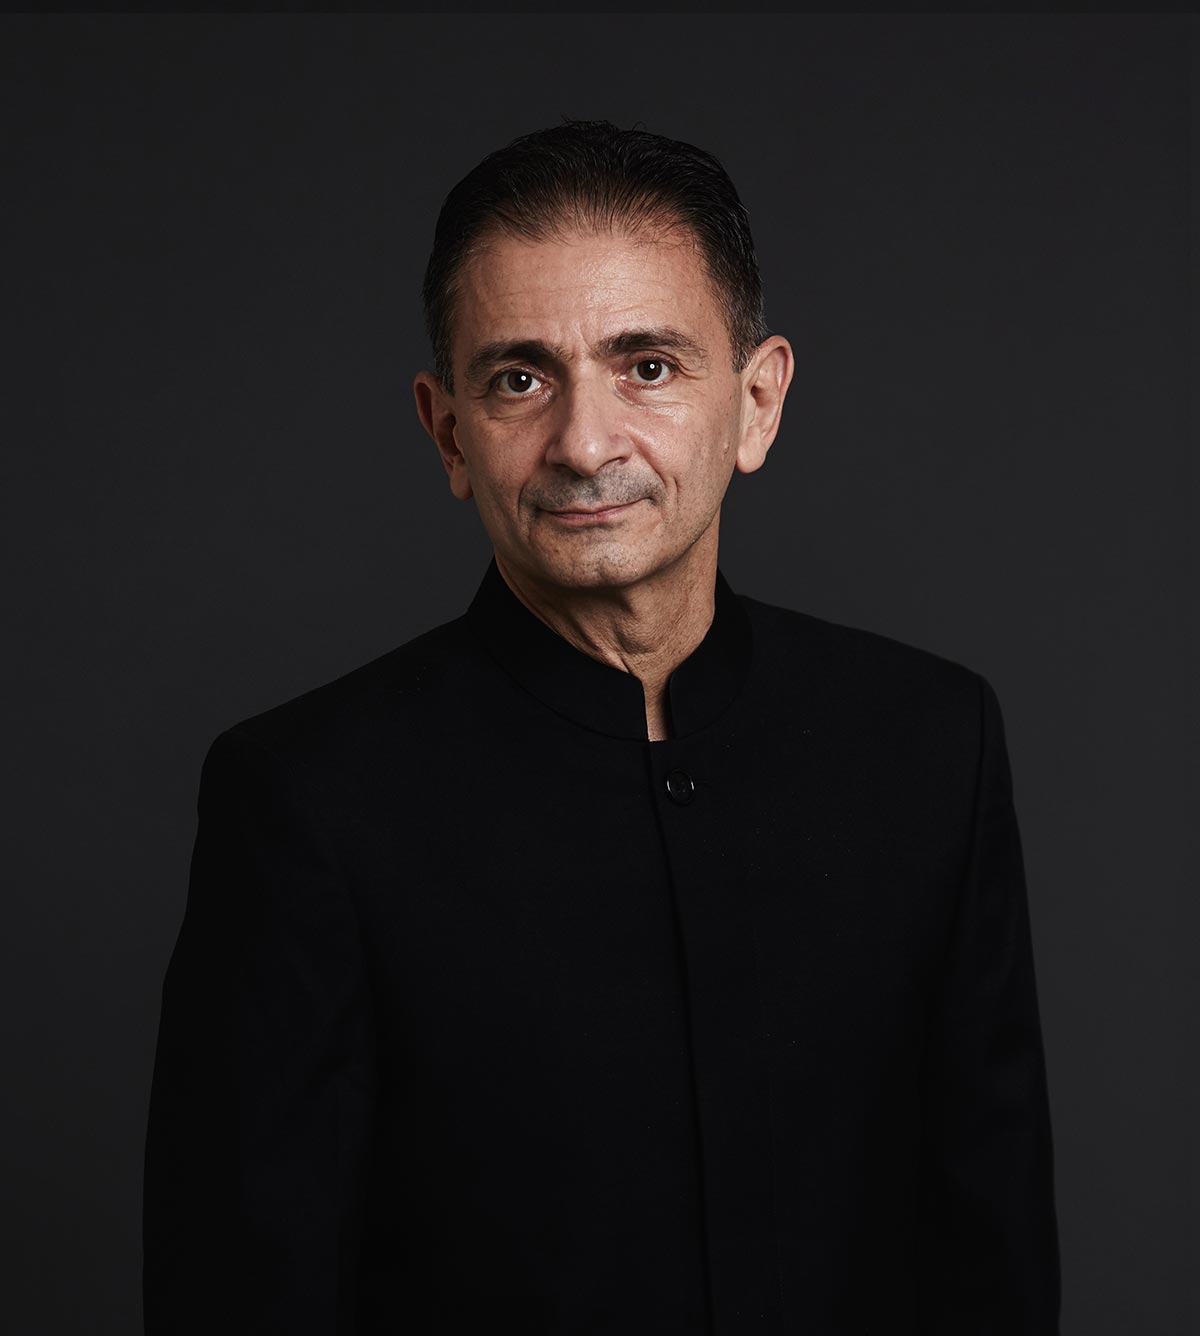 Dr. Joseph Curiale